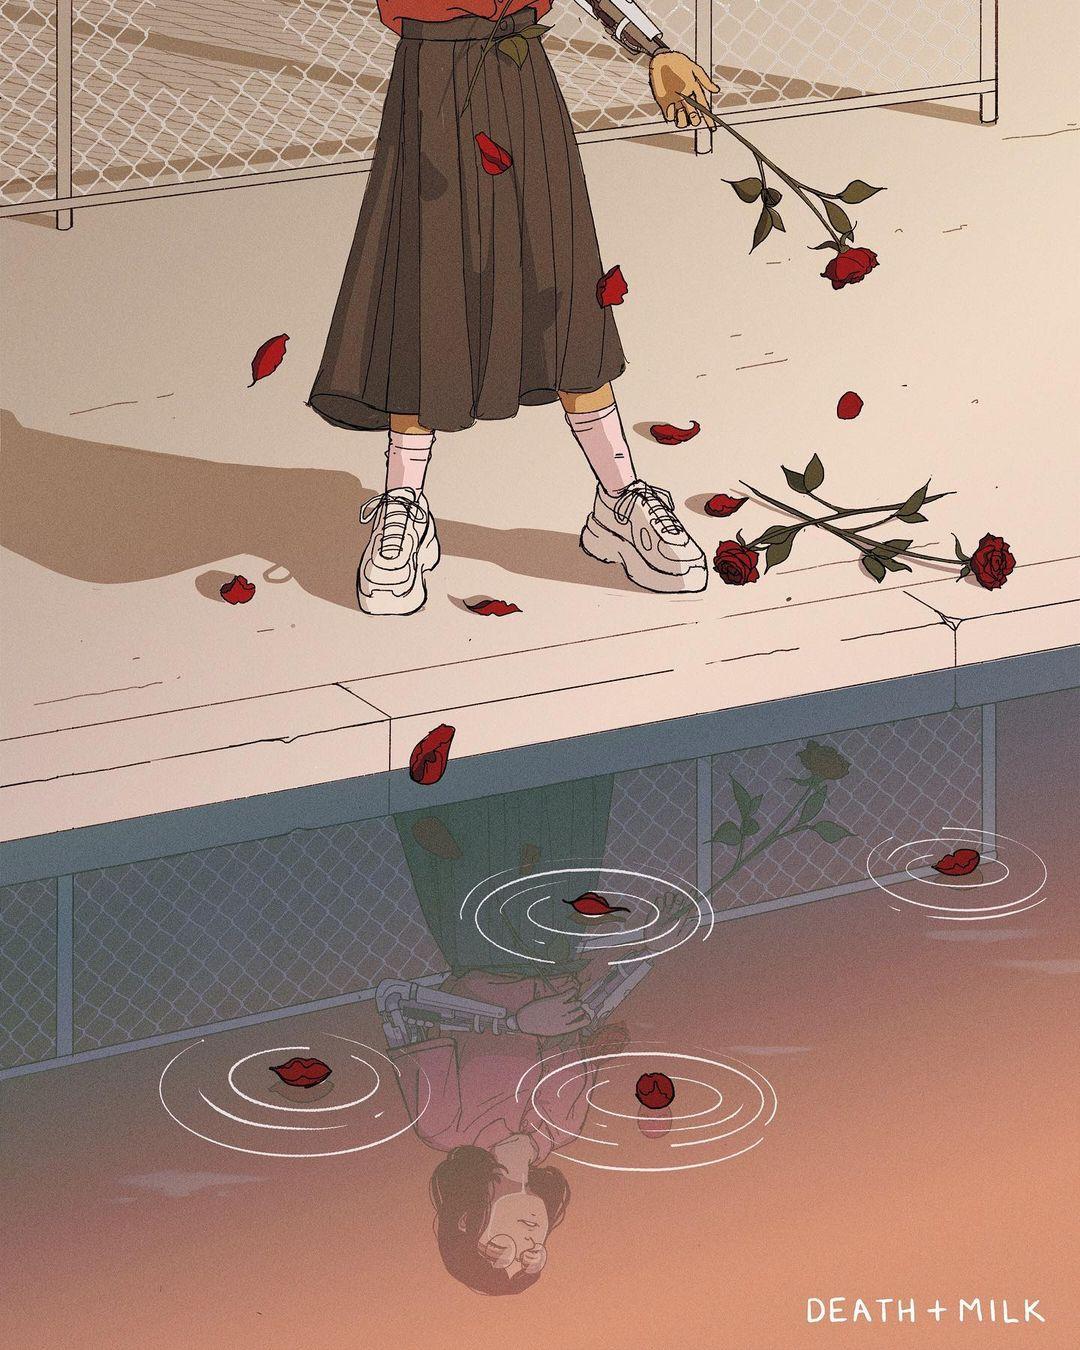 киберпанк-иллюстрации от Death & Milk (23).jpg